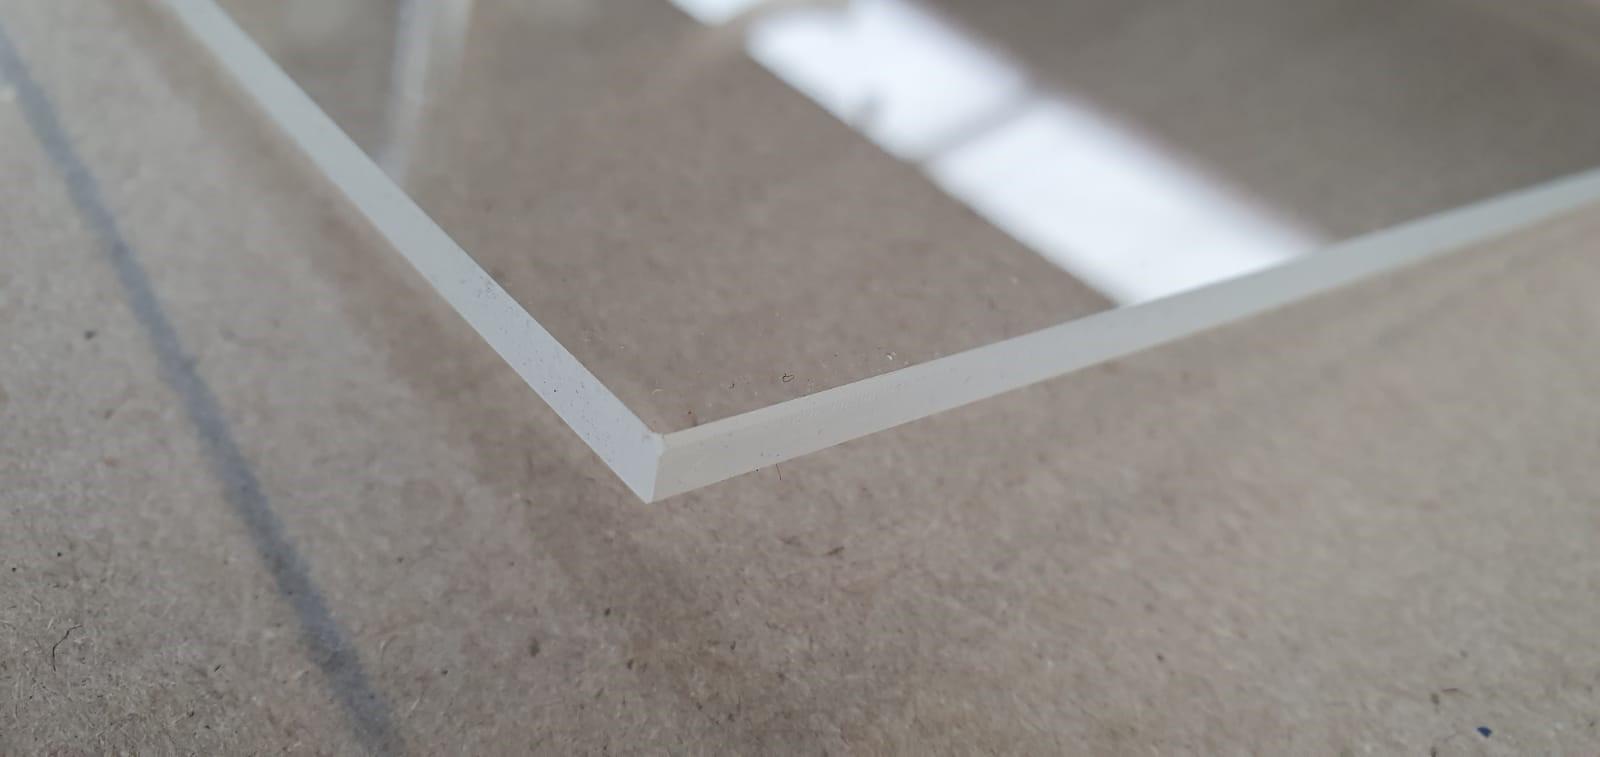 plexiglas scherpe randen verwijderen